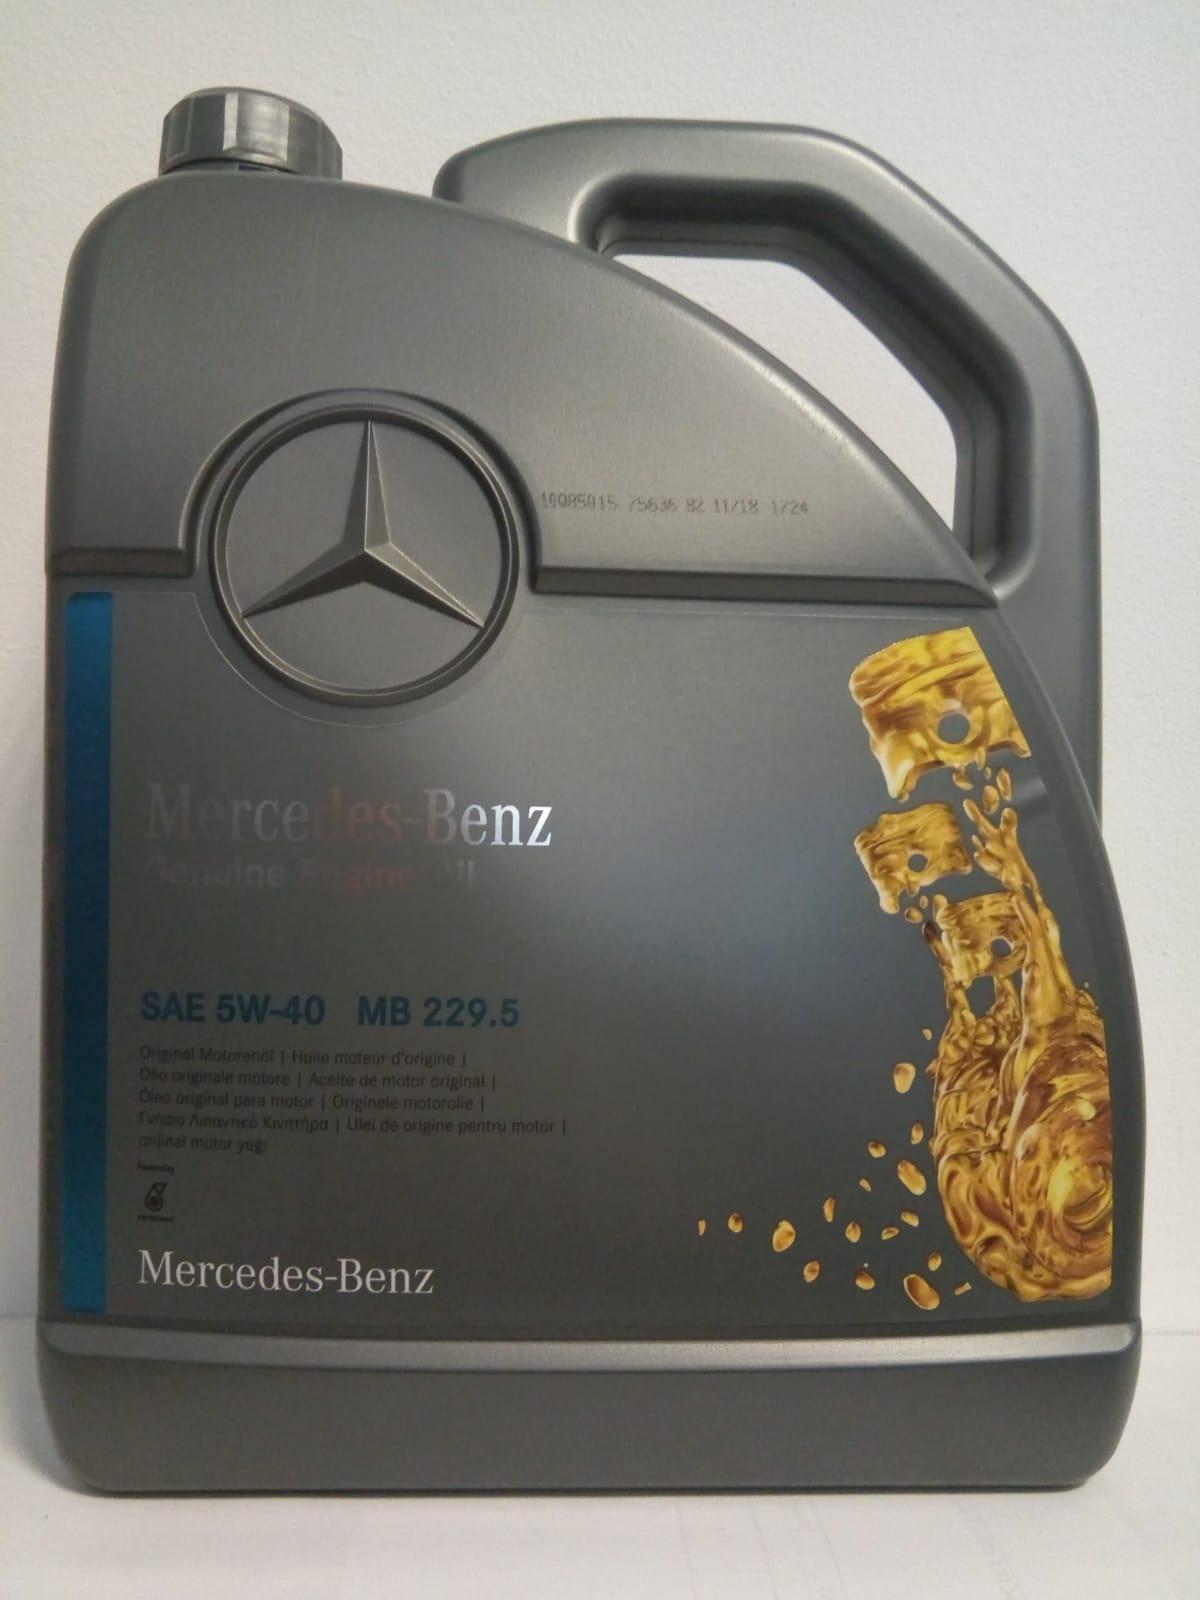 ULEI MOTOR ORIGINAL MERCEDES BENZ A0009898301BAA4 5W40 (MB 229.5) 5L